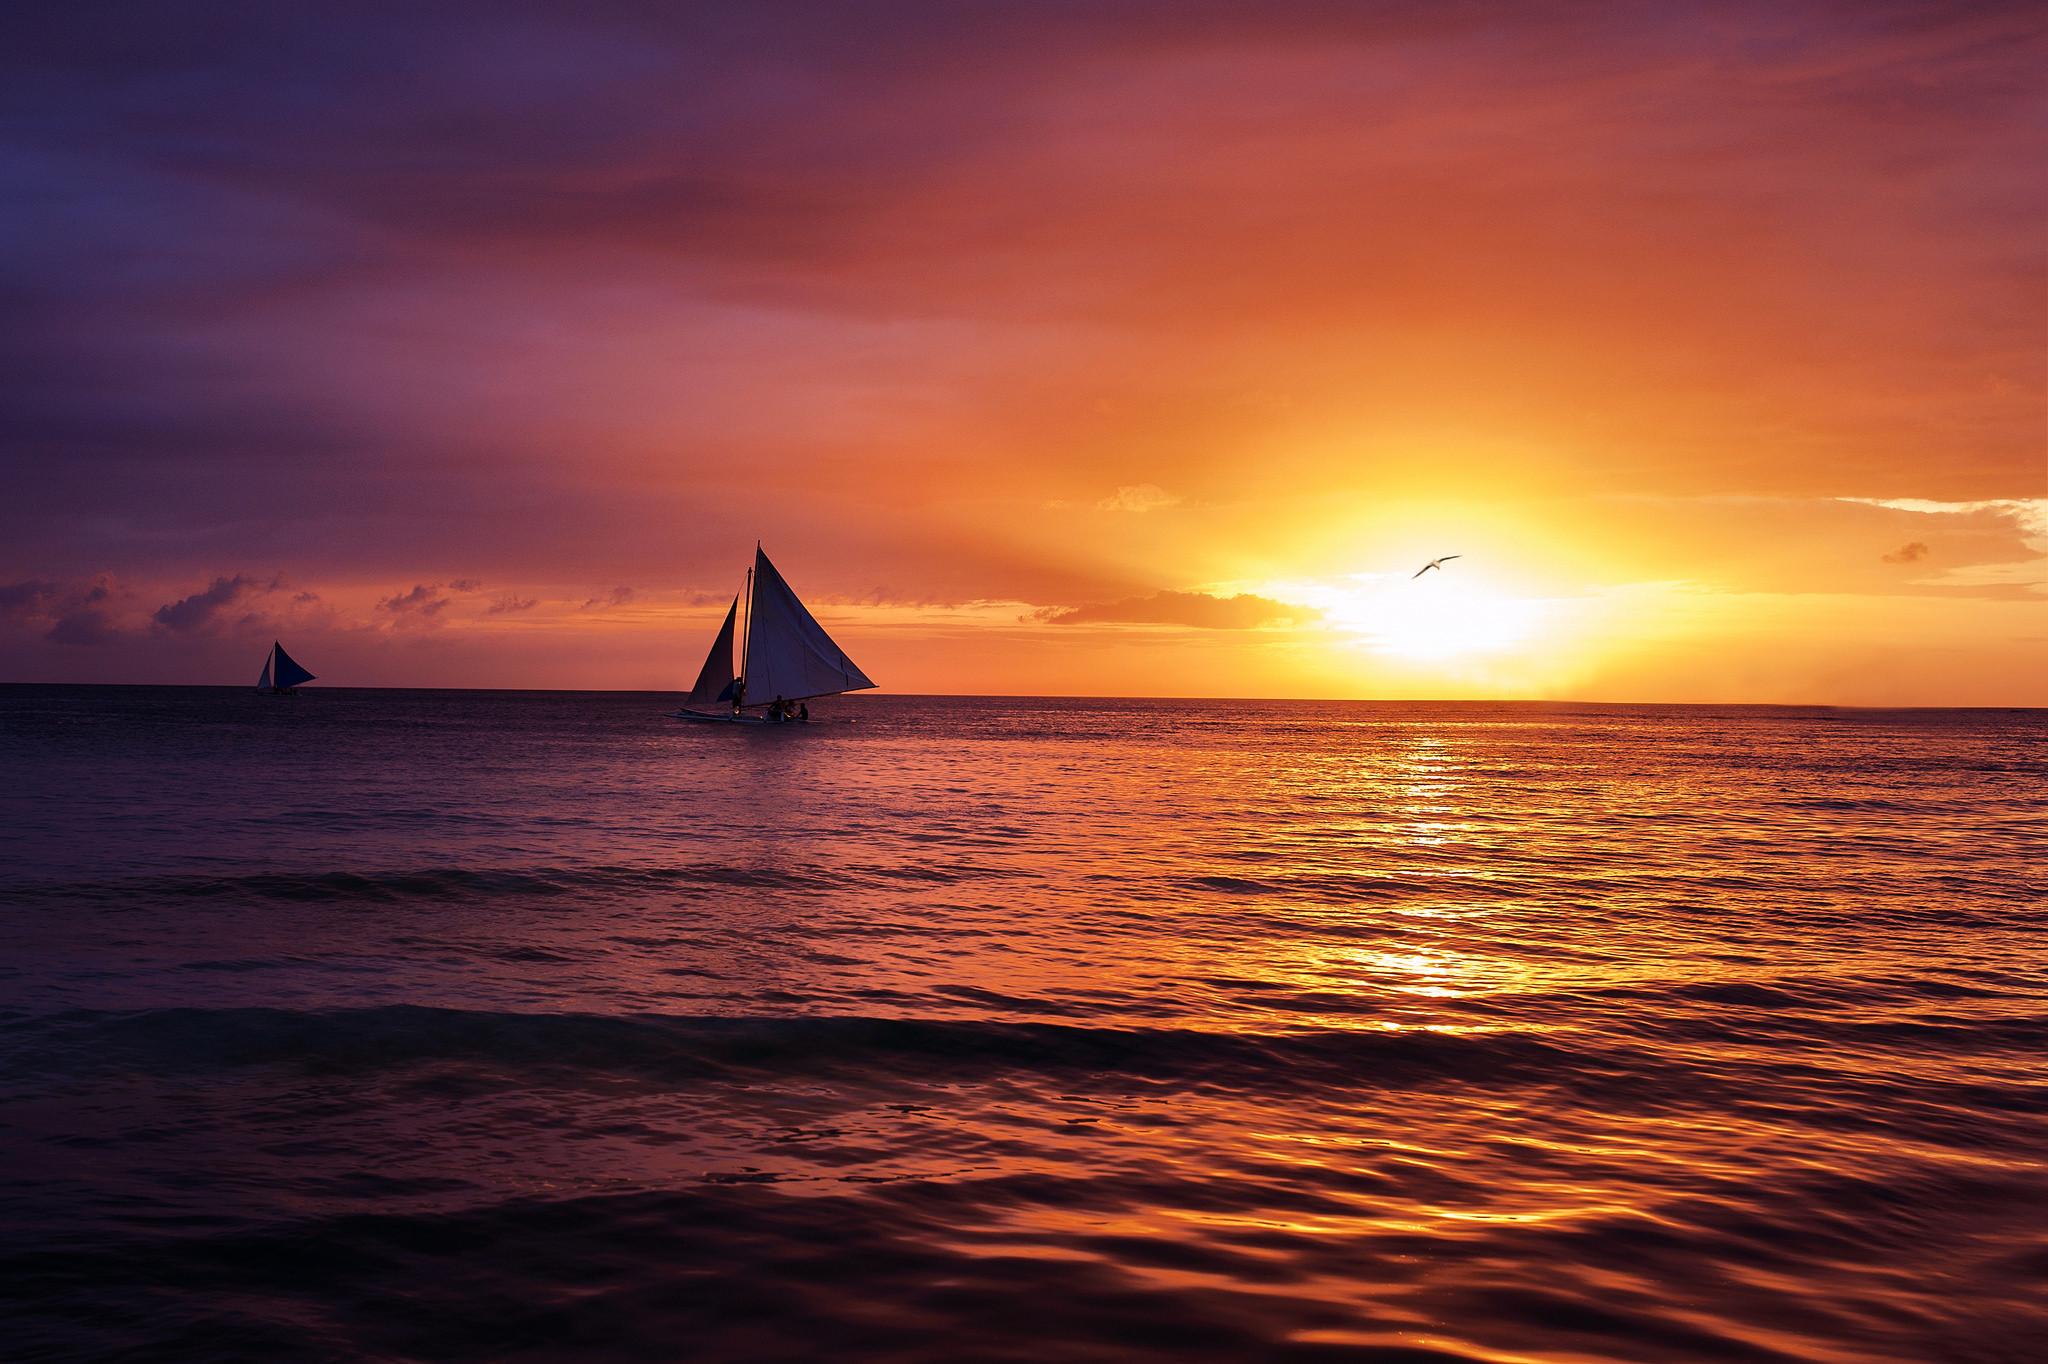 ocean-evening-sunset background